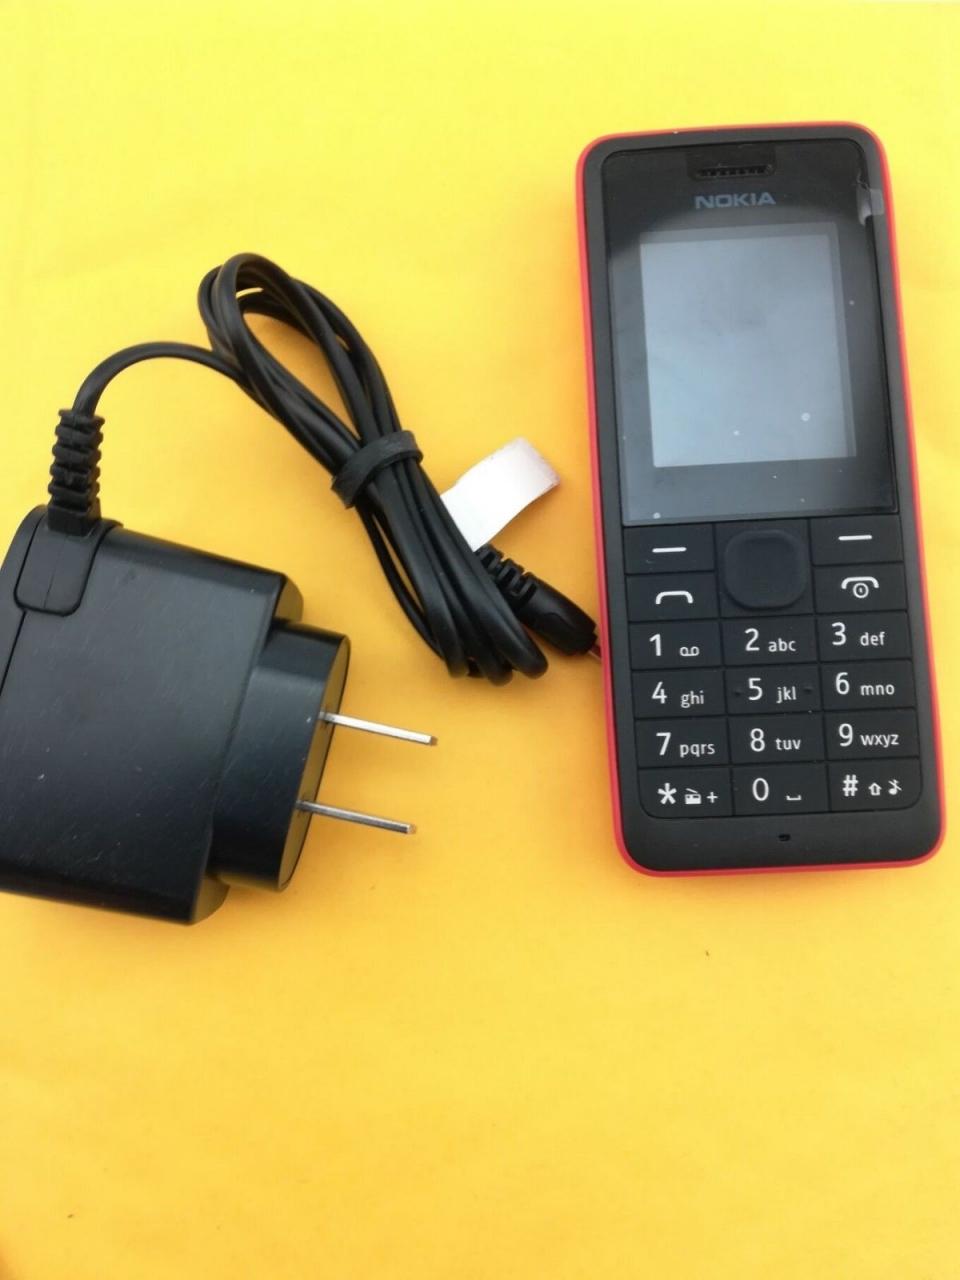 new Nokia 106 Unlocked Simple Mobile Phone Multiple keyboards languages white 8